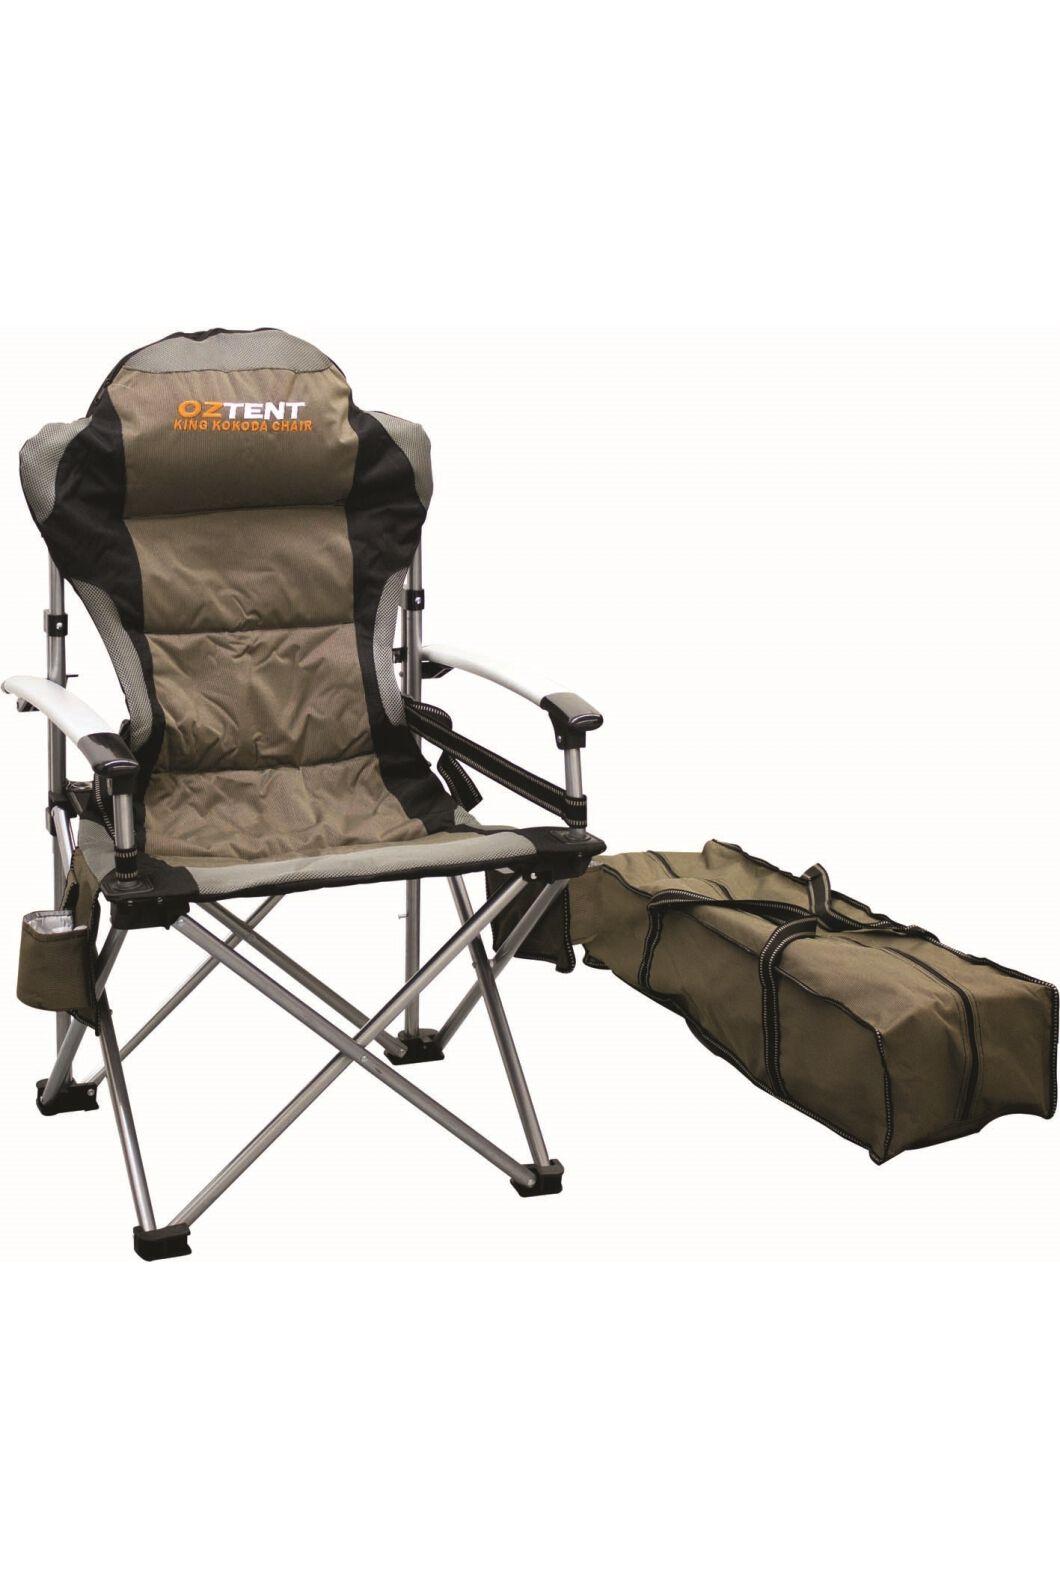 Oztent King Kokoda Chair, None, hi-res